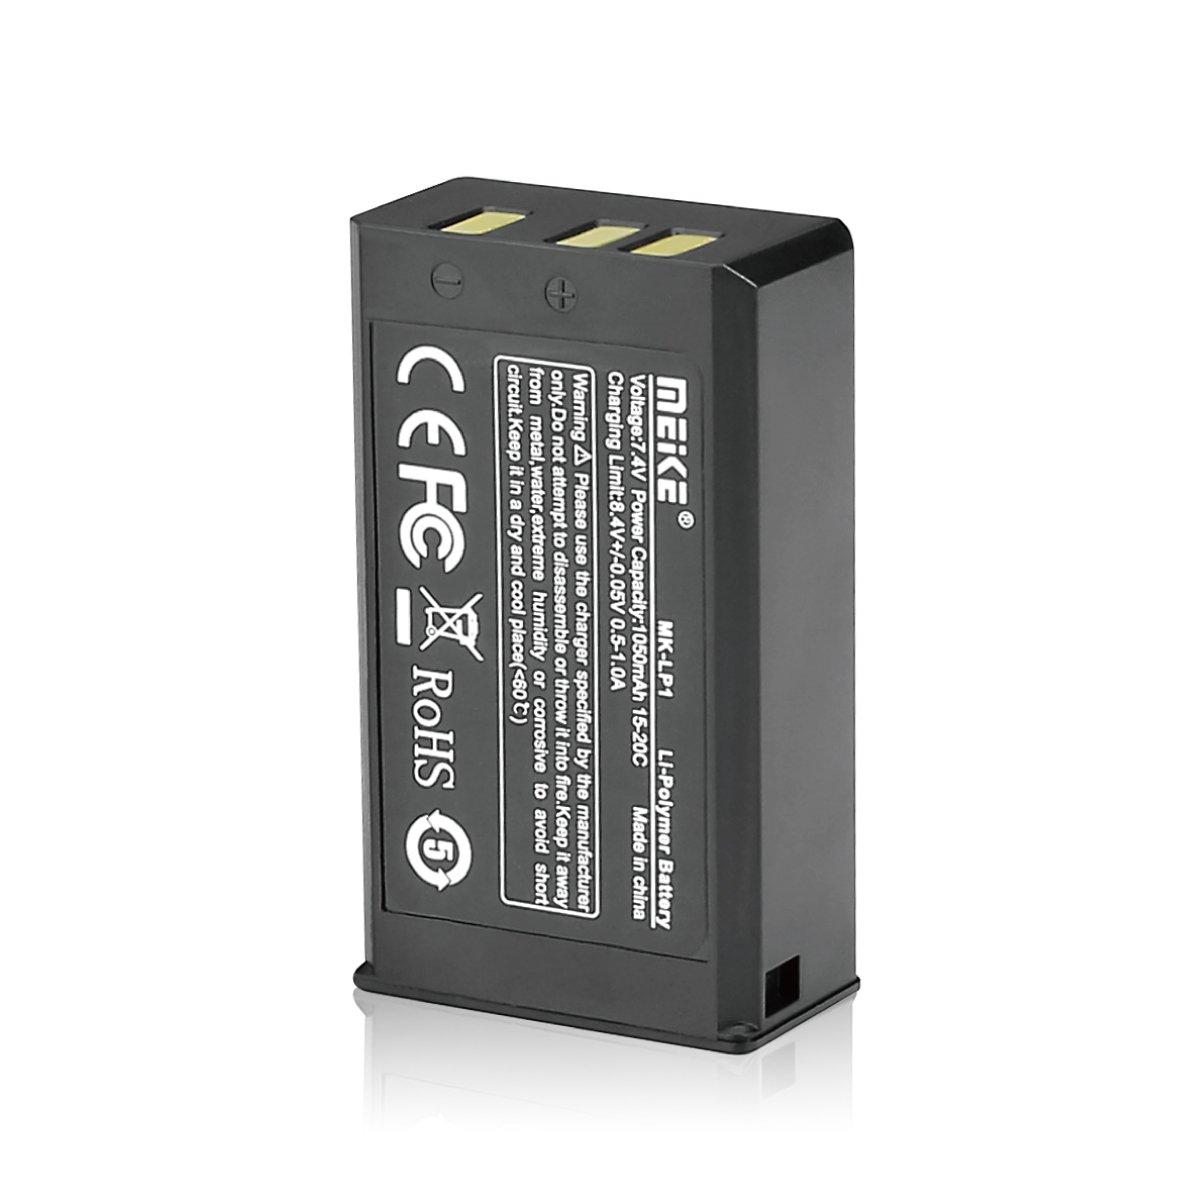 Meike MK-LP1 Li-Polymer Battery for MK 420 Speedlite Series